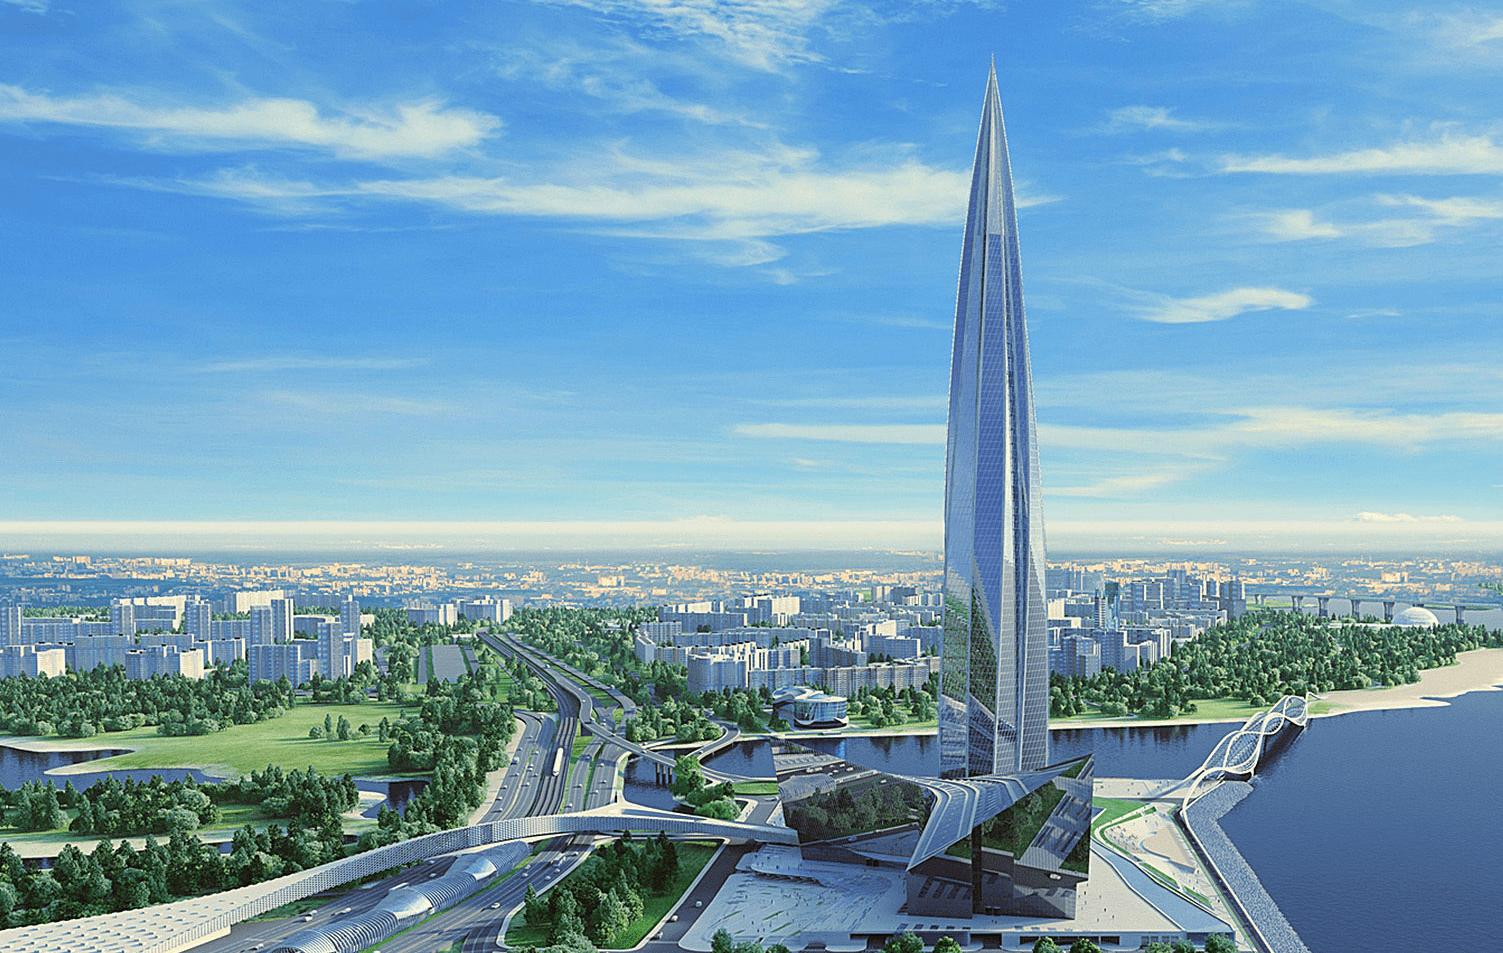 Строительство МФК «Лахта - Центр» в г. Санкт - Петербург